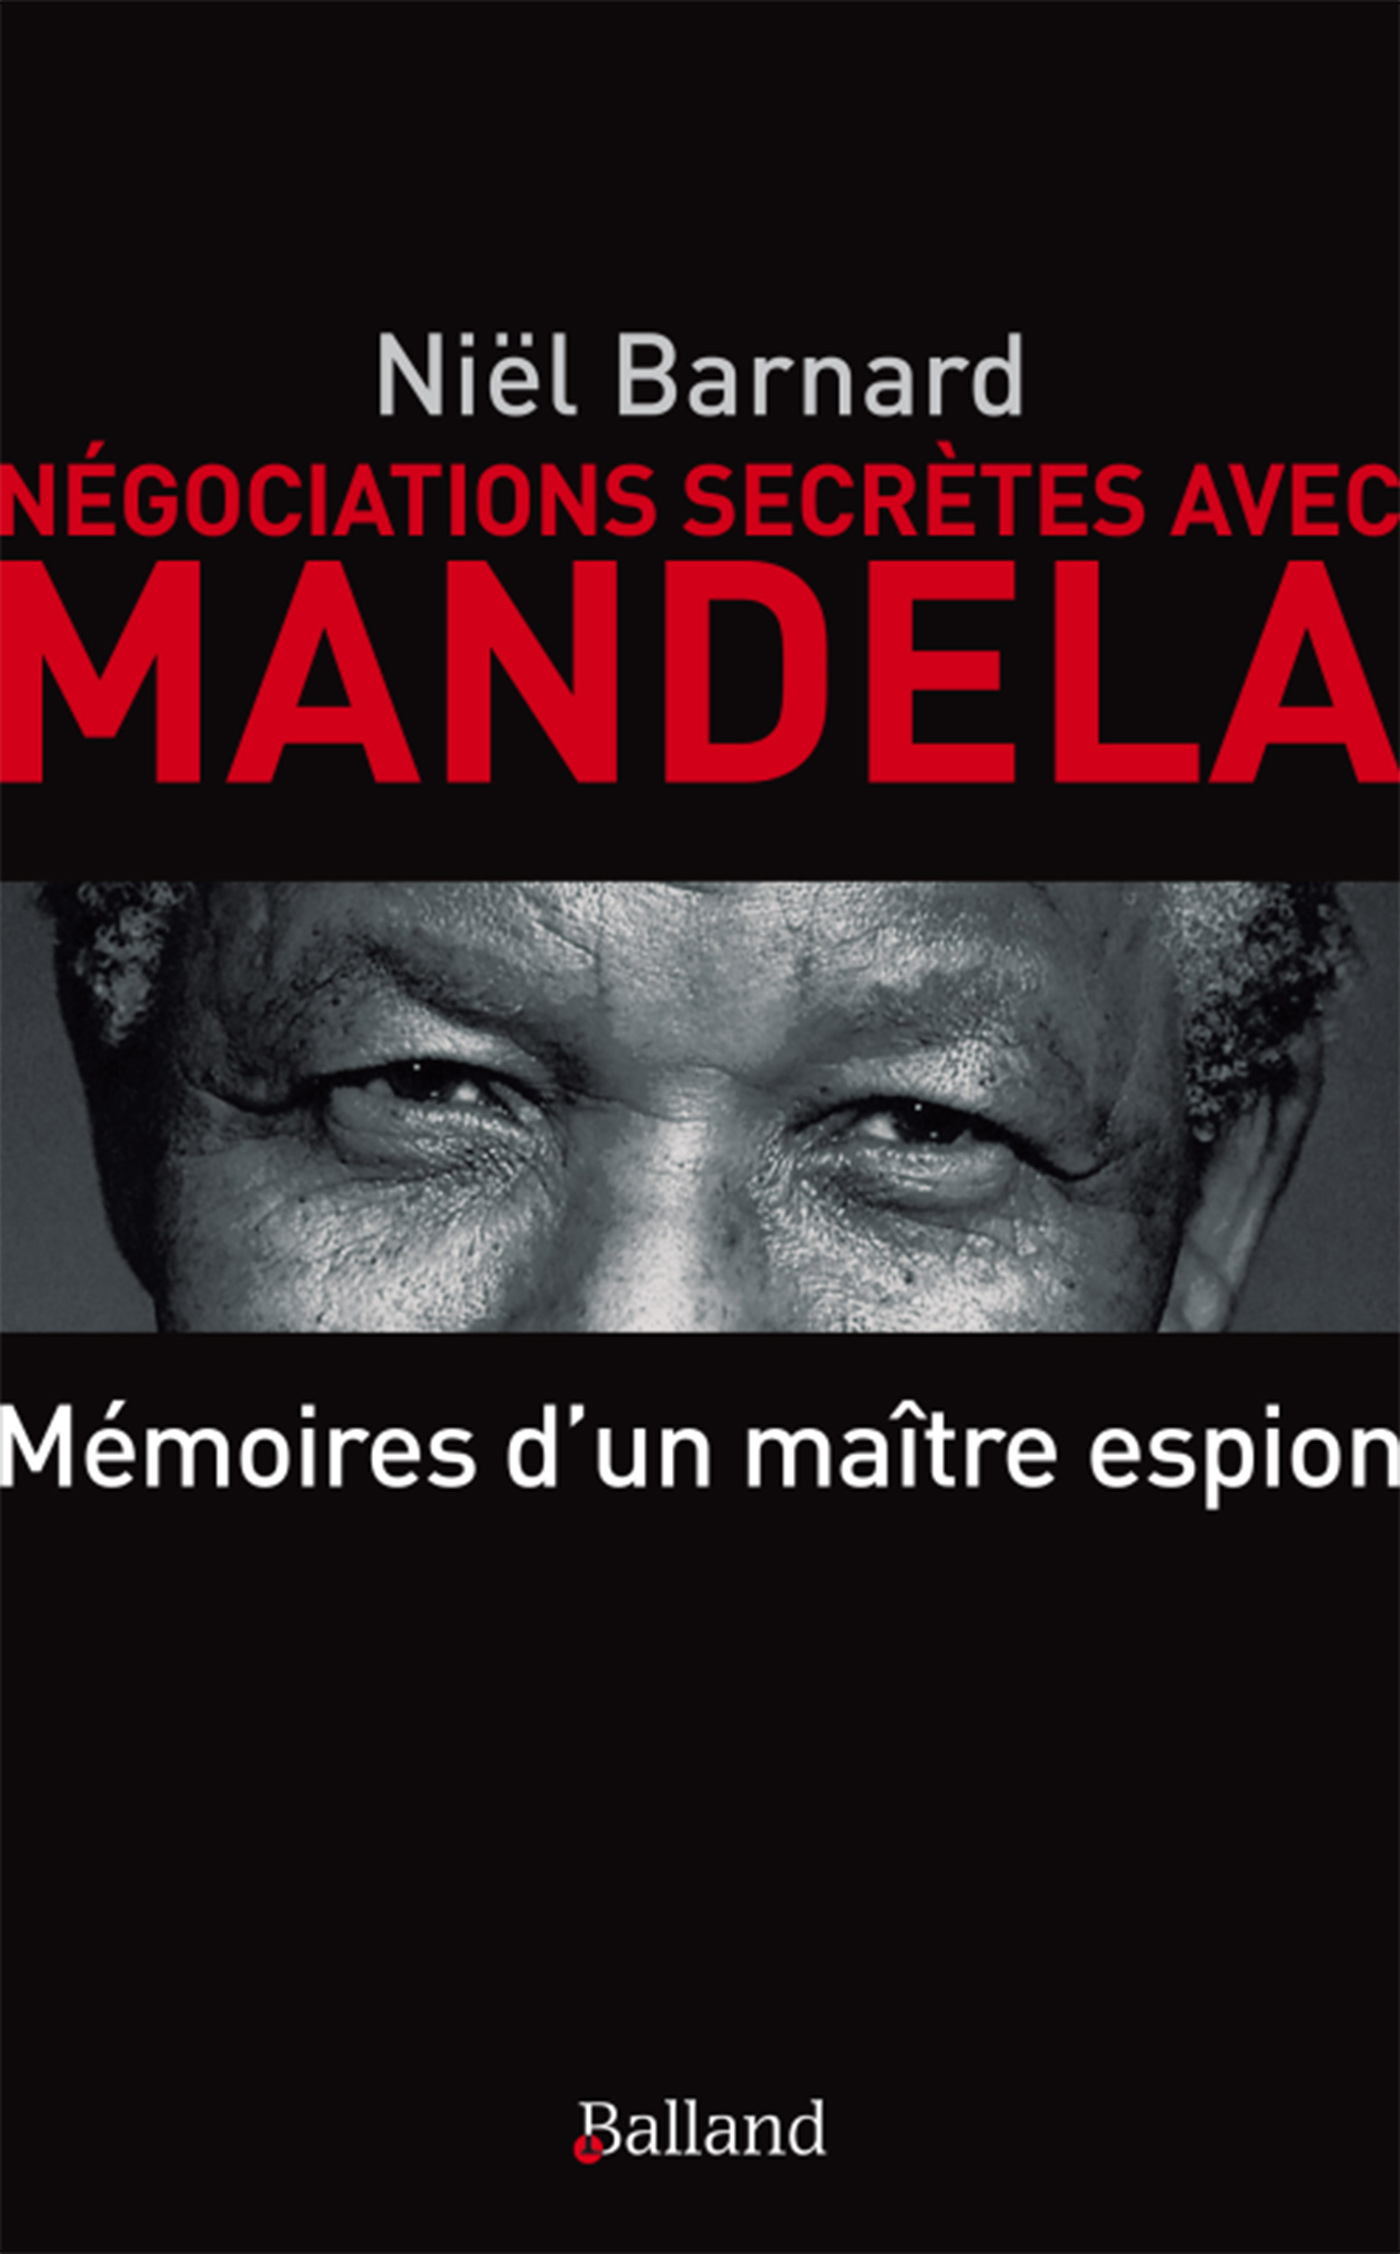 NEGOCIATION SECRETES AVEC MANDELA MEMOIRES D UN PATRON DE L